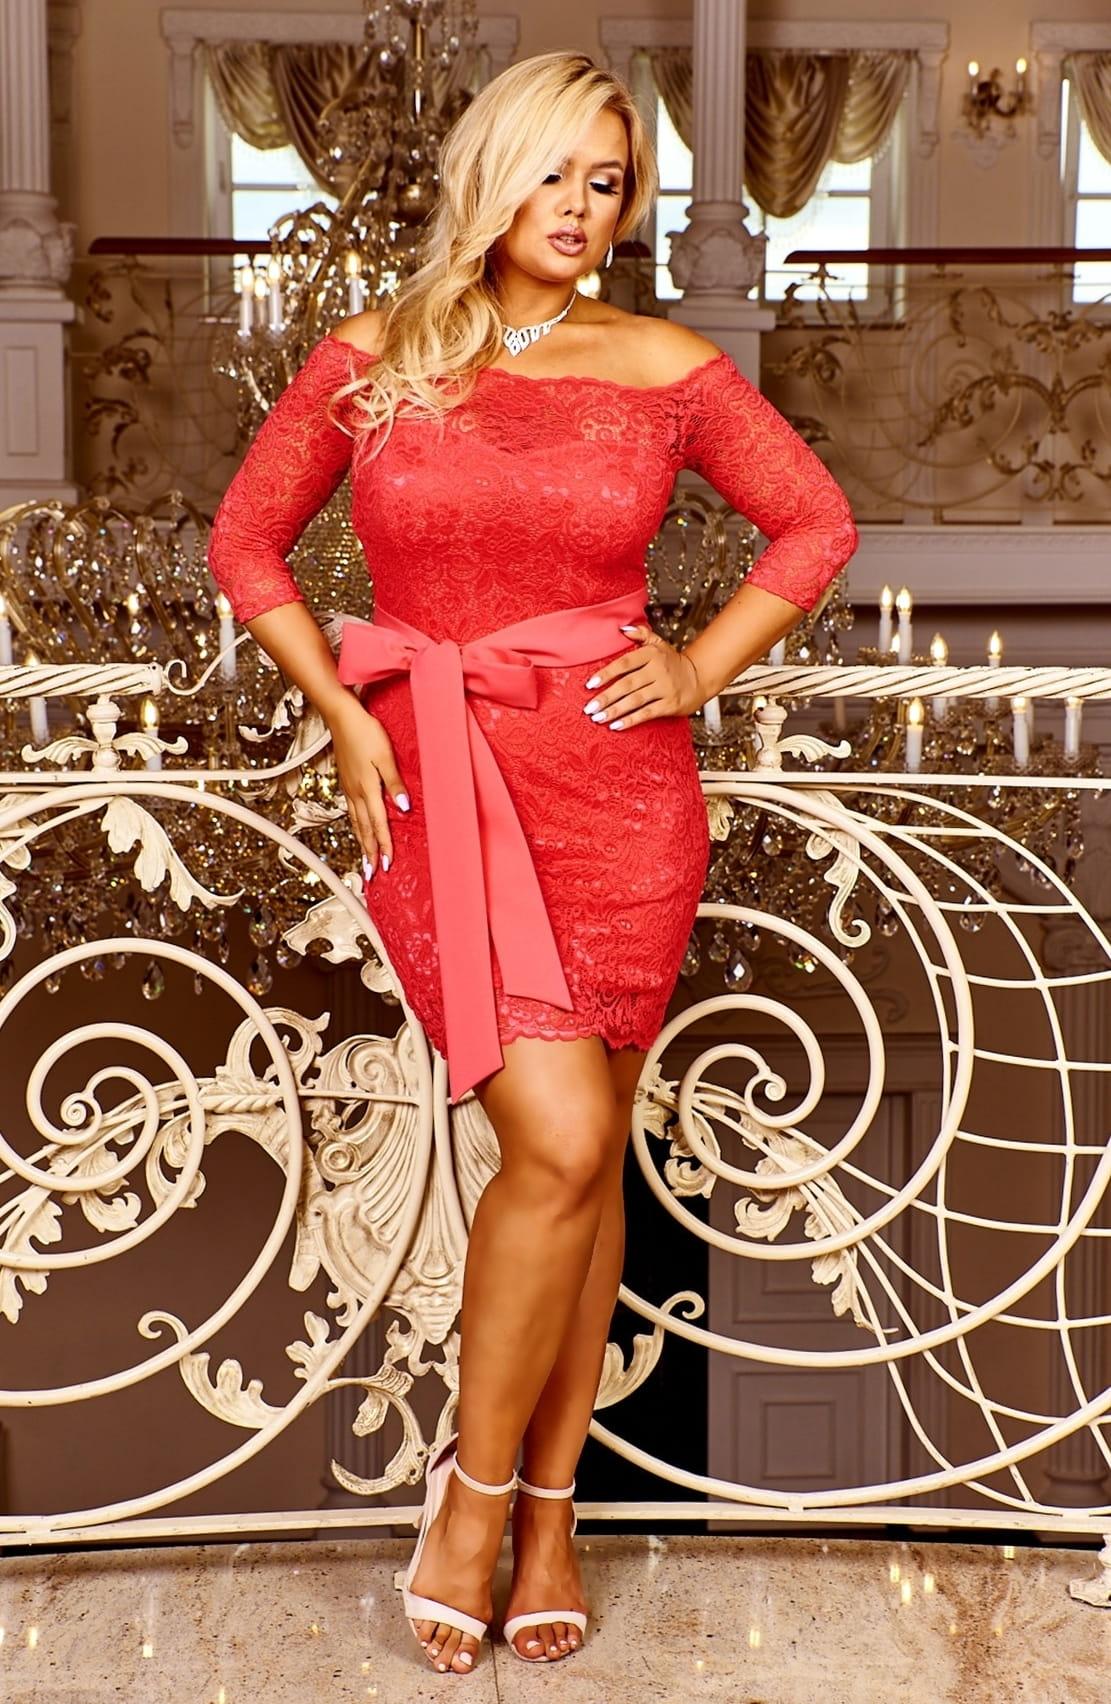 BOSCA FASHION Krajkové šaty VERONICA s odhalenými rameny a 3/4 rukávem Barva: Korálová, Velikost: S